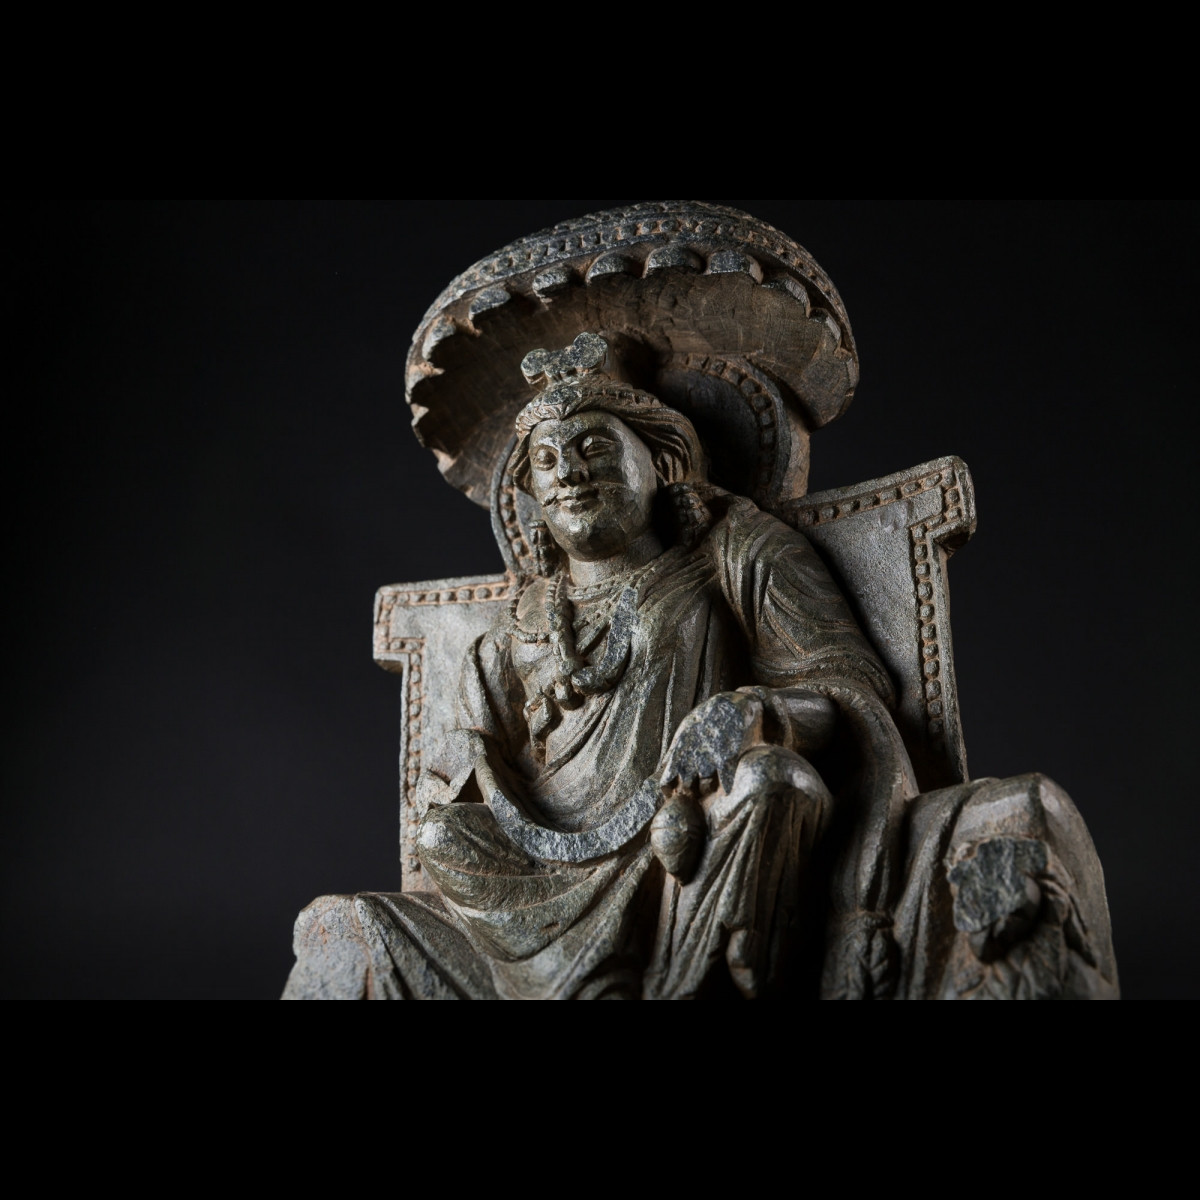 Photo of bodhisattva-maitreya-schist-deated-in-majestyghandara-pakistan-galerie-golconda-musuem-quality